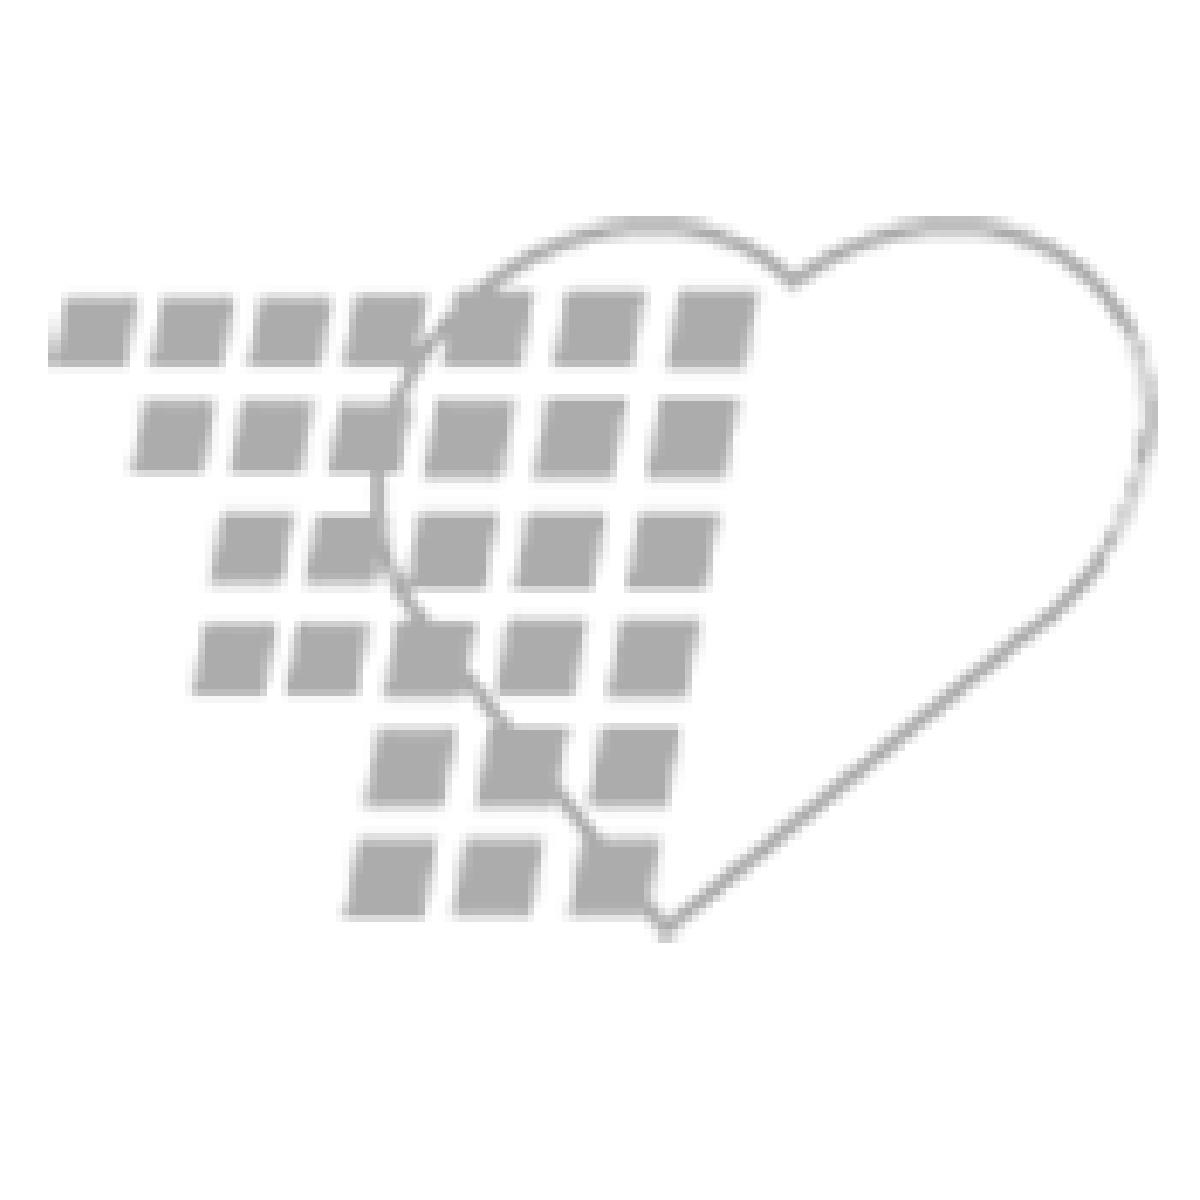 04-71-6120 PurAir-Flow Laminar Flow Cabinet (Hood)